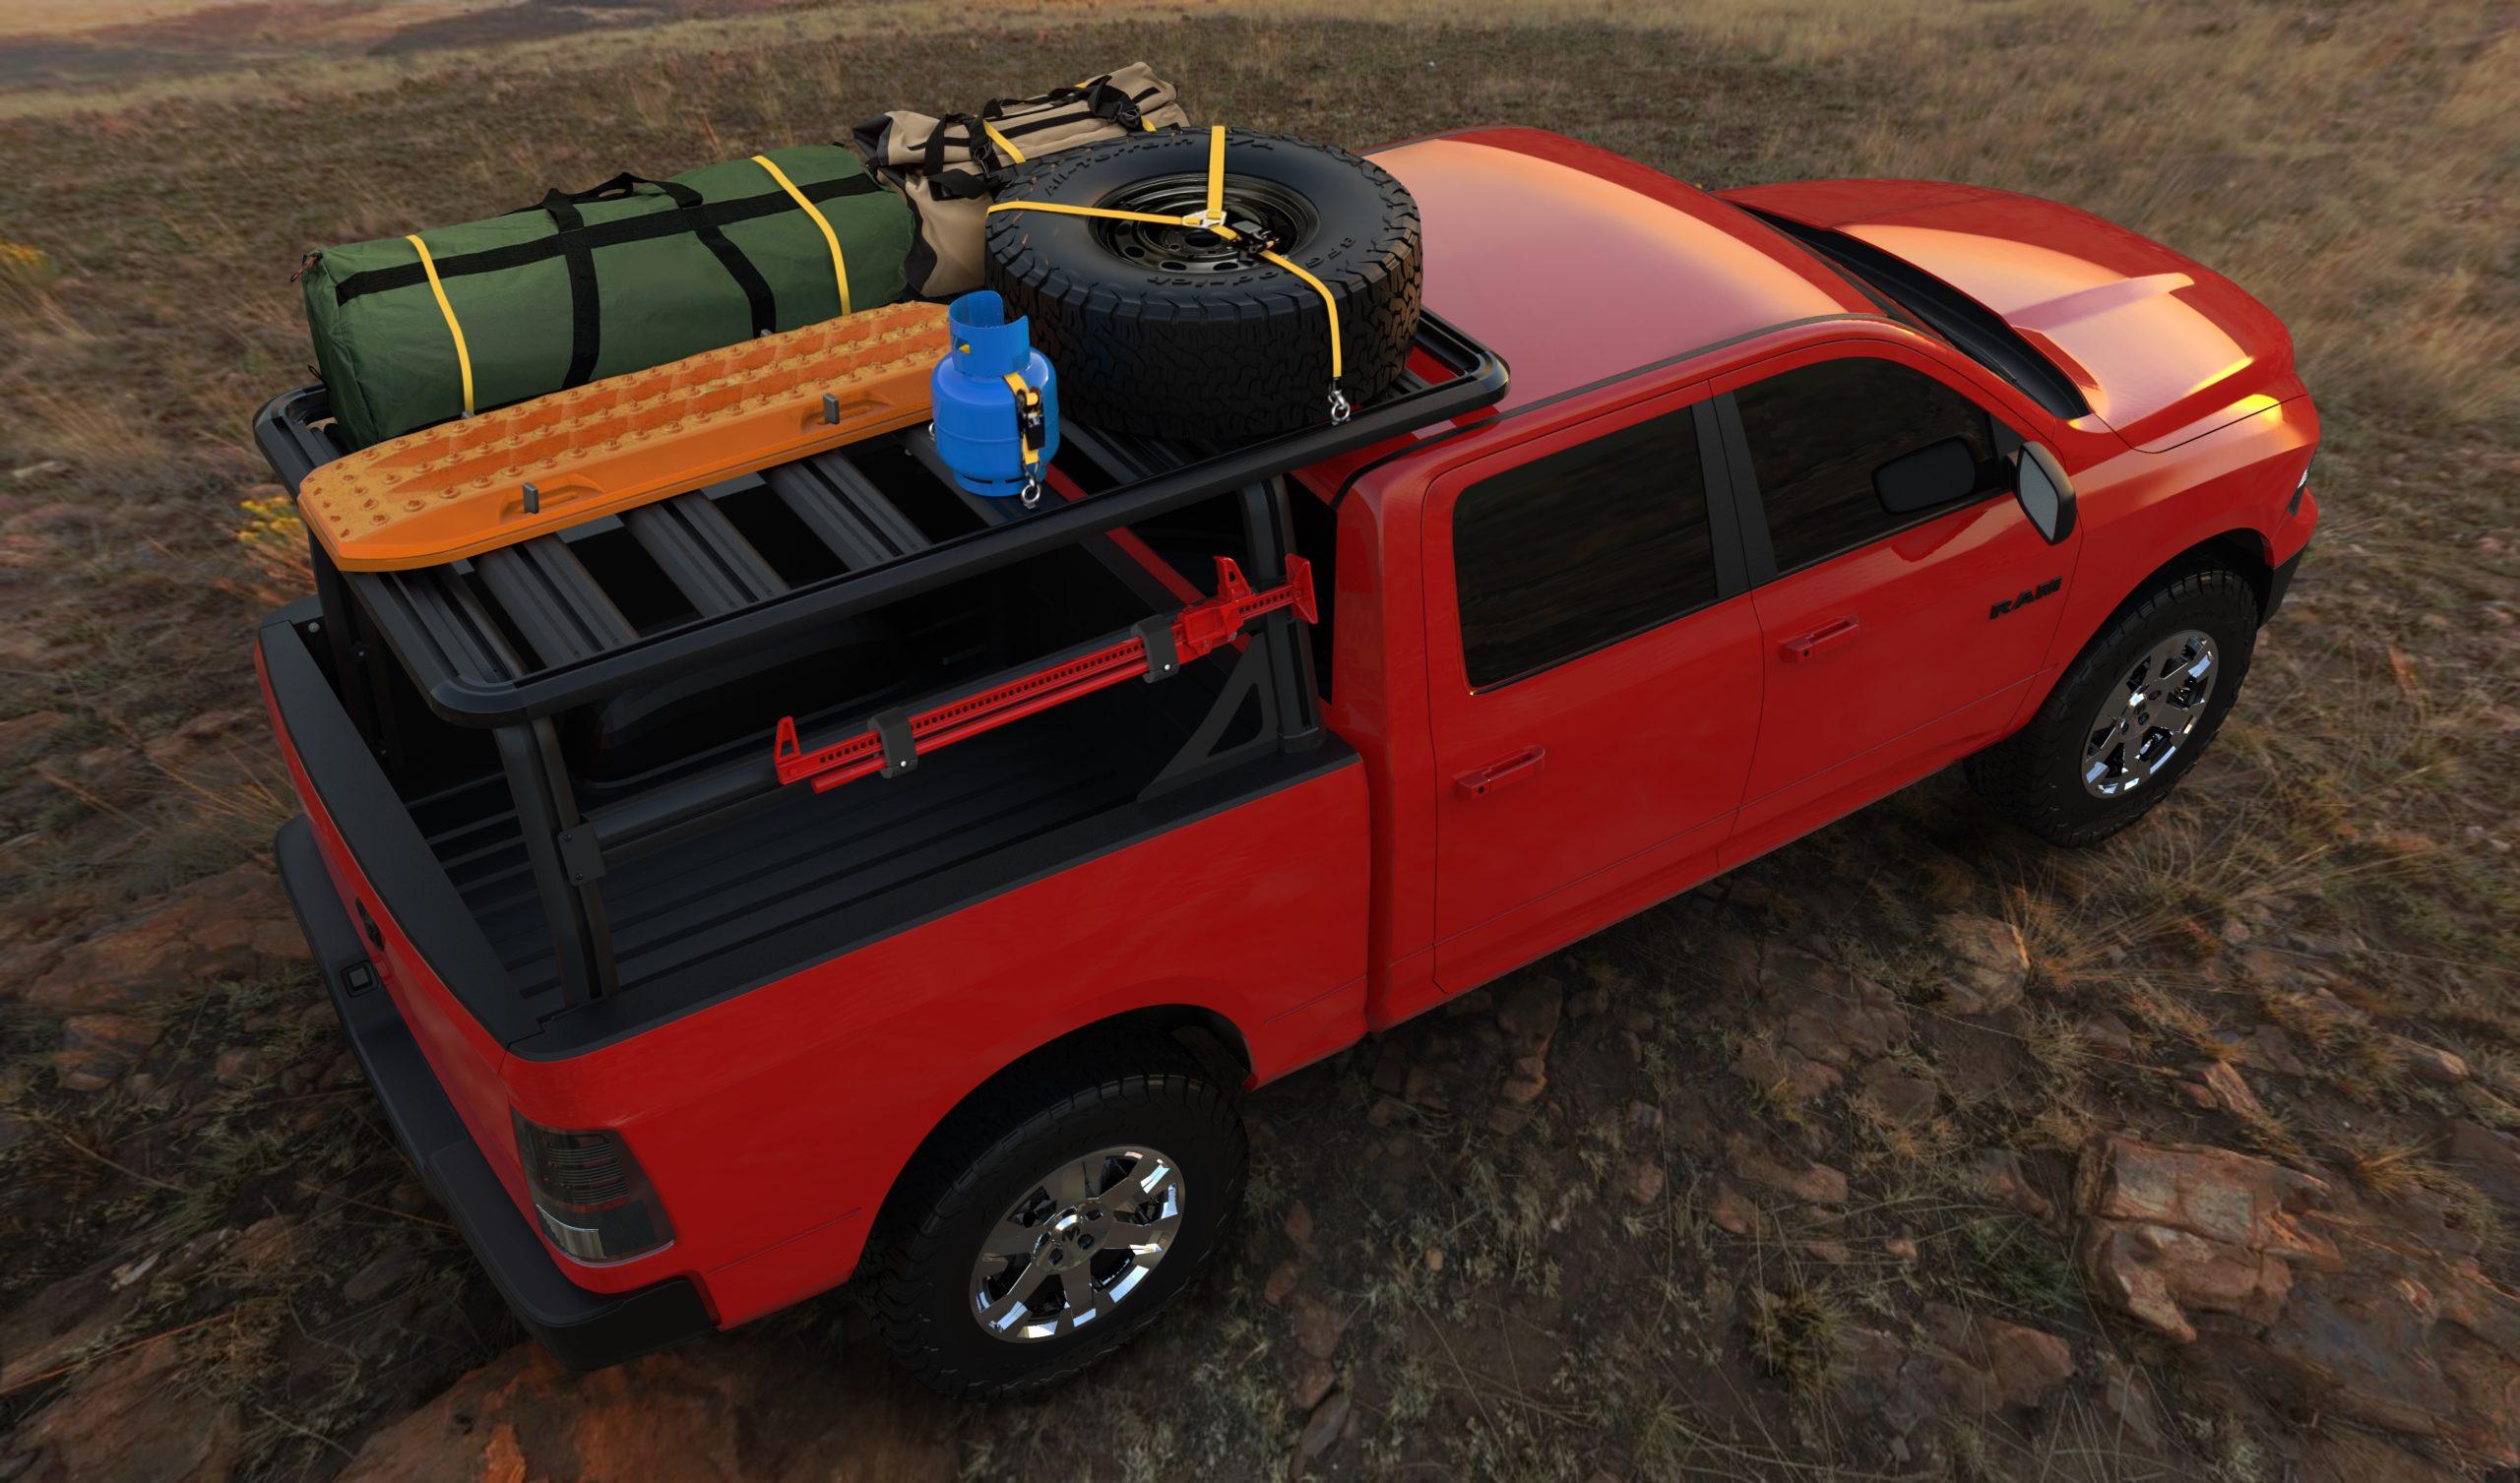 heavy duty platform rack loaded with camping gear